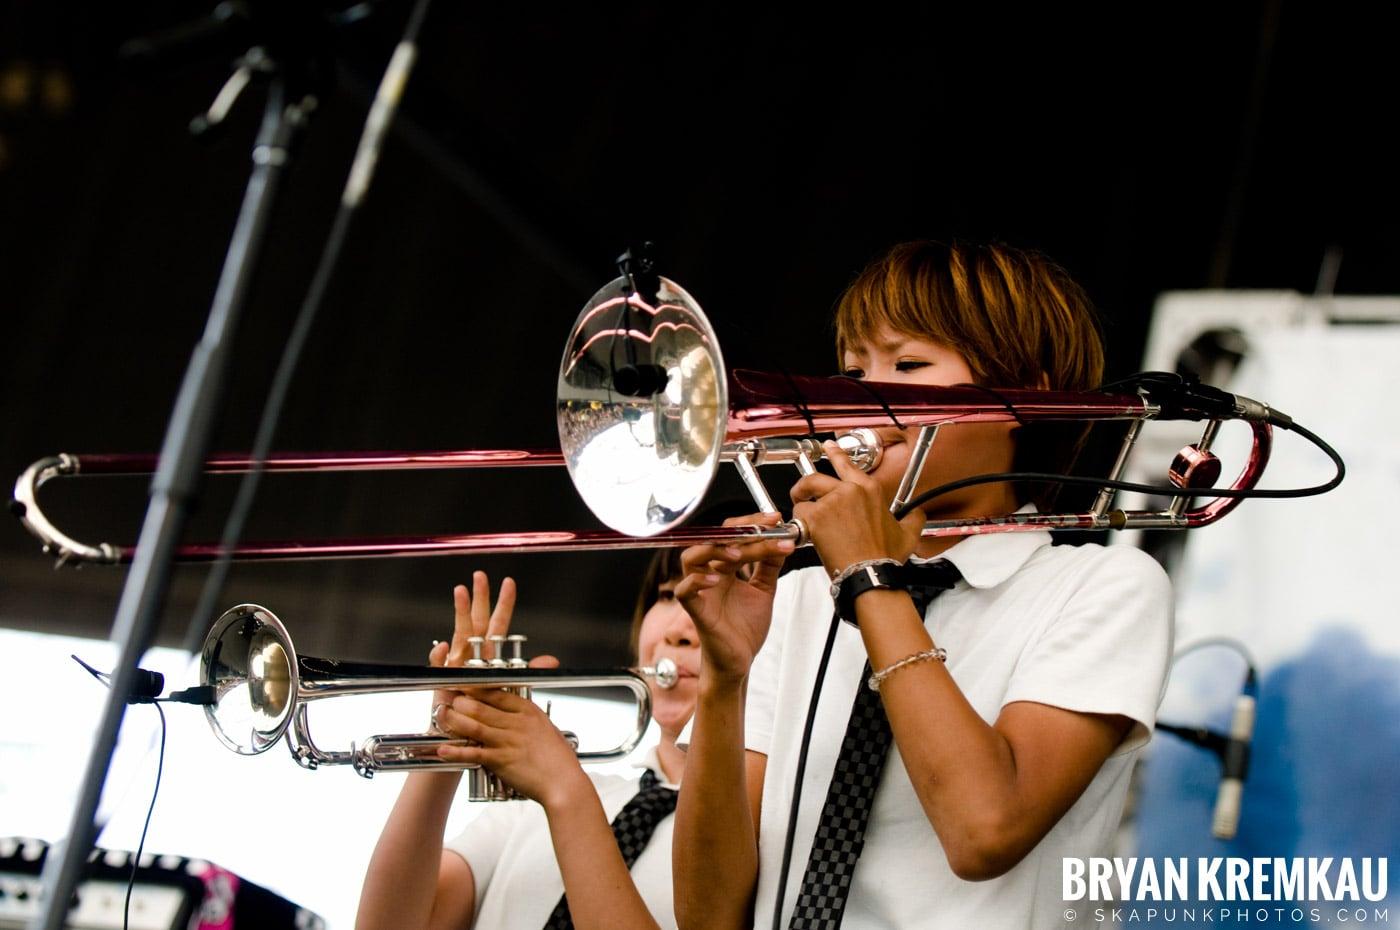 Oreskaband @ Warped Tour 08, Scranton PA - 7.27.08 (11)